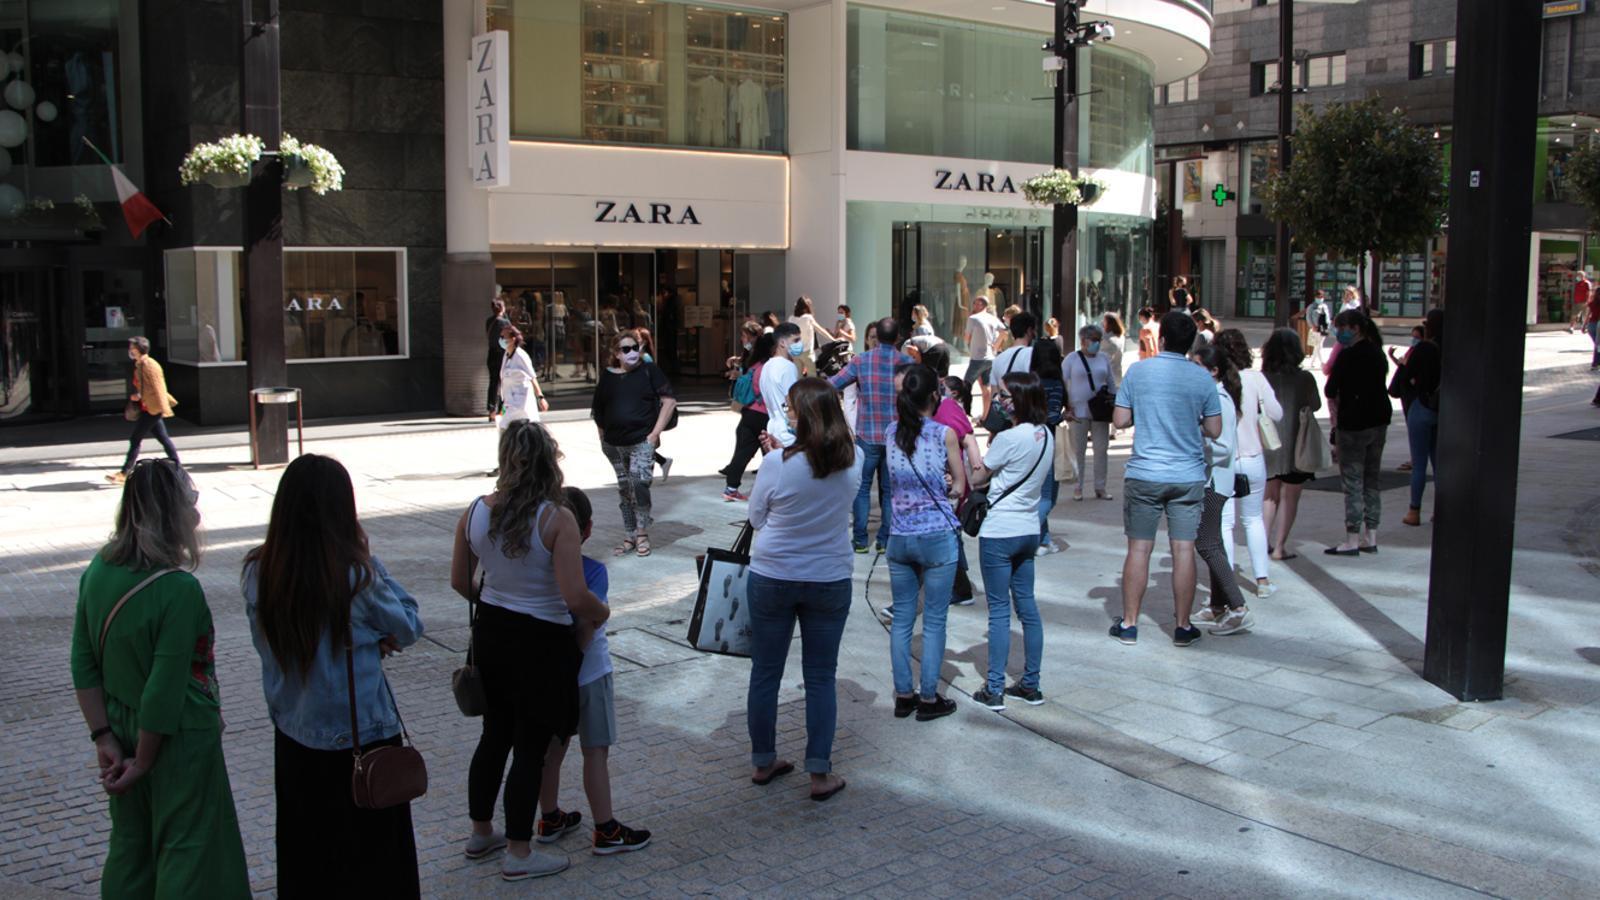 Algunes persones fan cua per entrar a una botiga de roba. / M. P. (ANA)